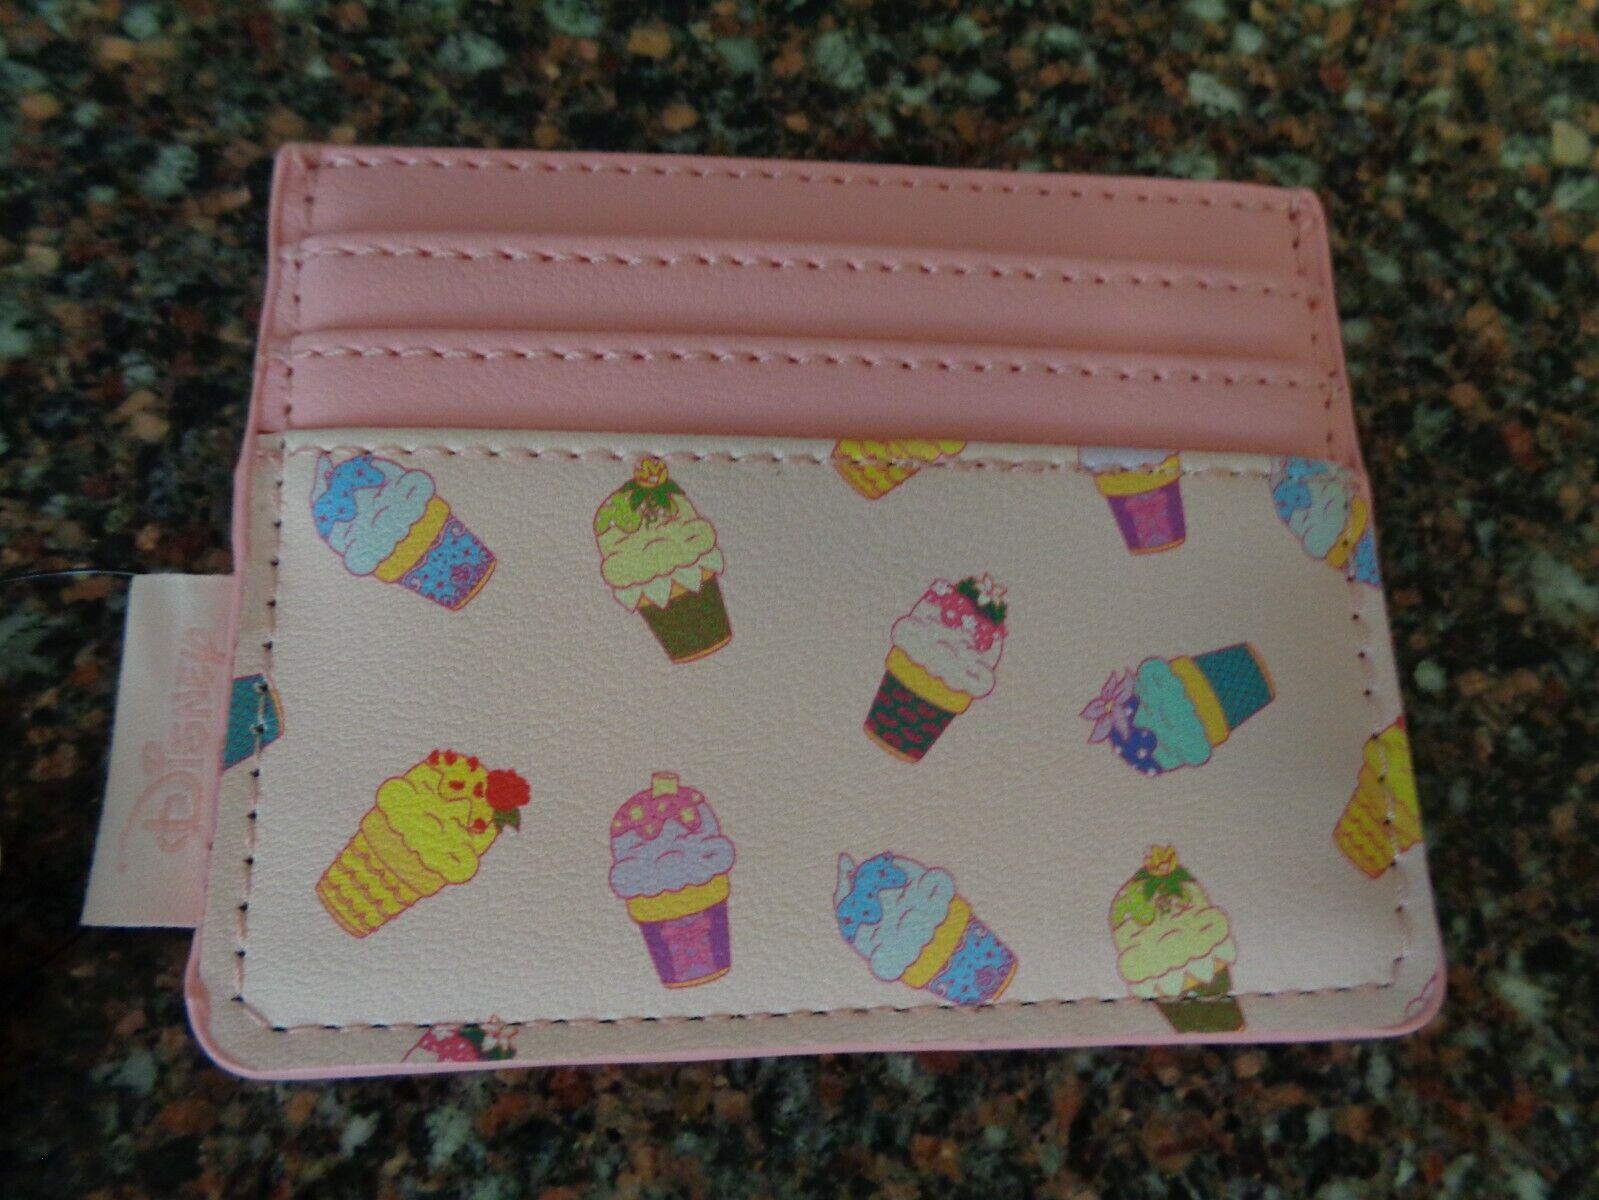 Loungefly Disney Princess Ice Cream Cones Cardholder Pink NWT New